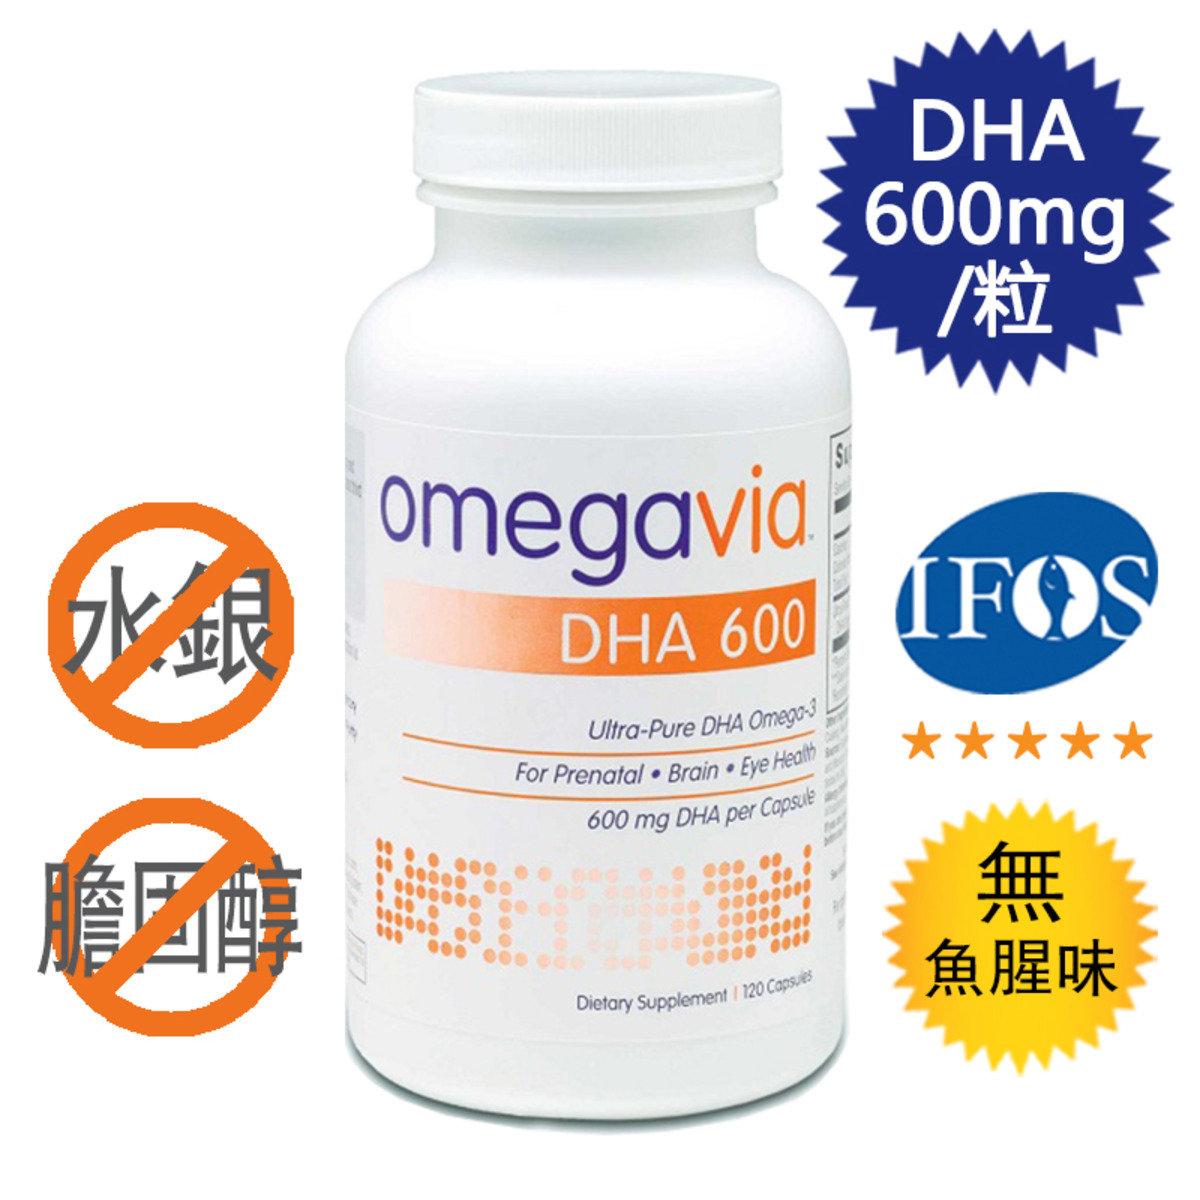 極純DHA 600 魚油丸(DHA ONLY) 120粒